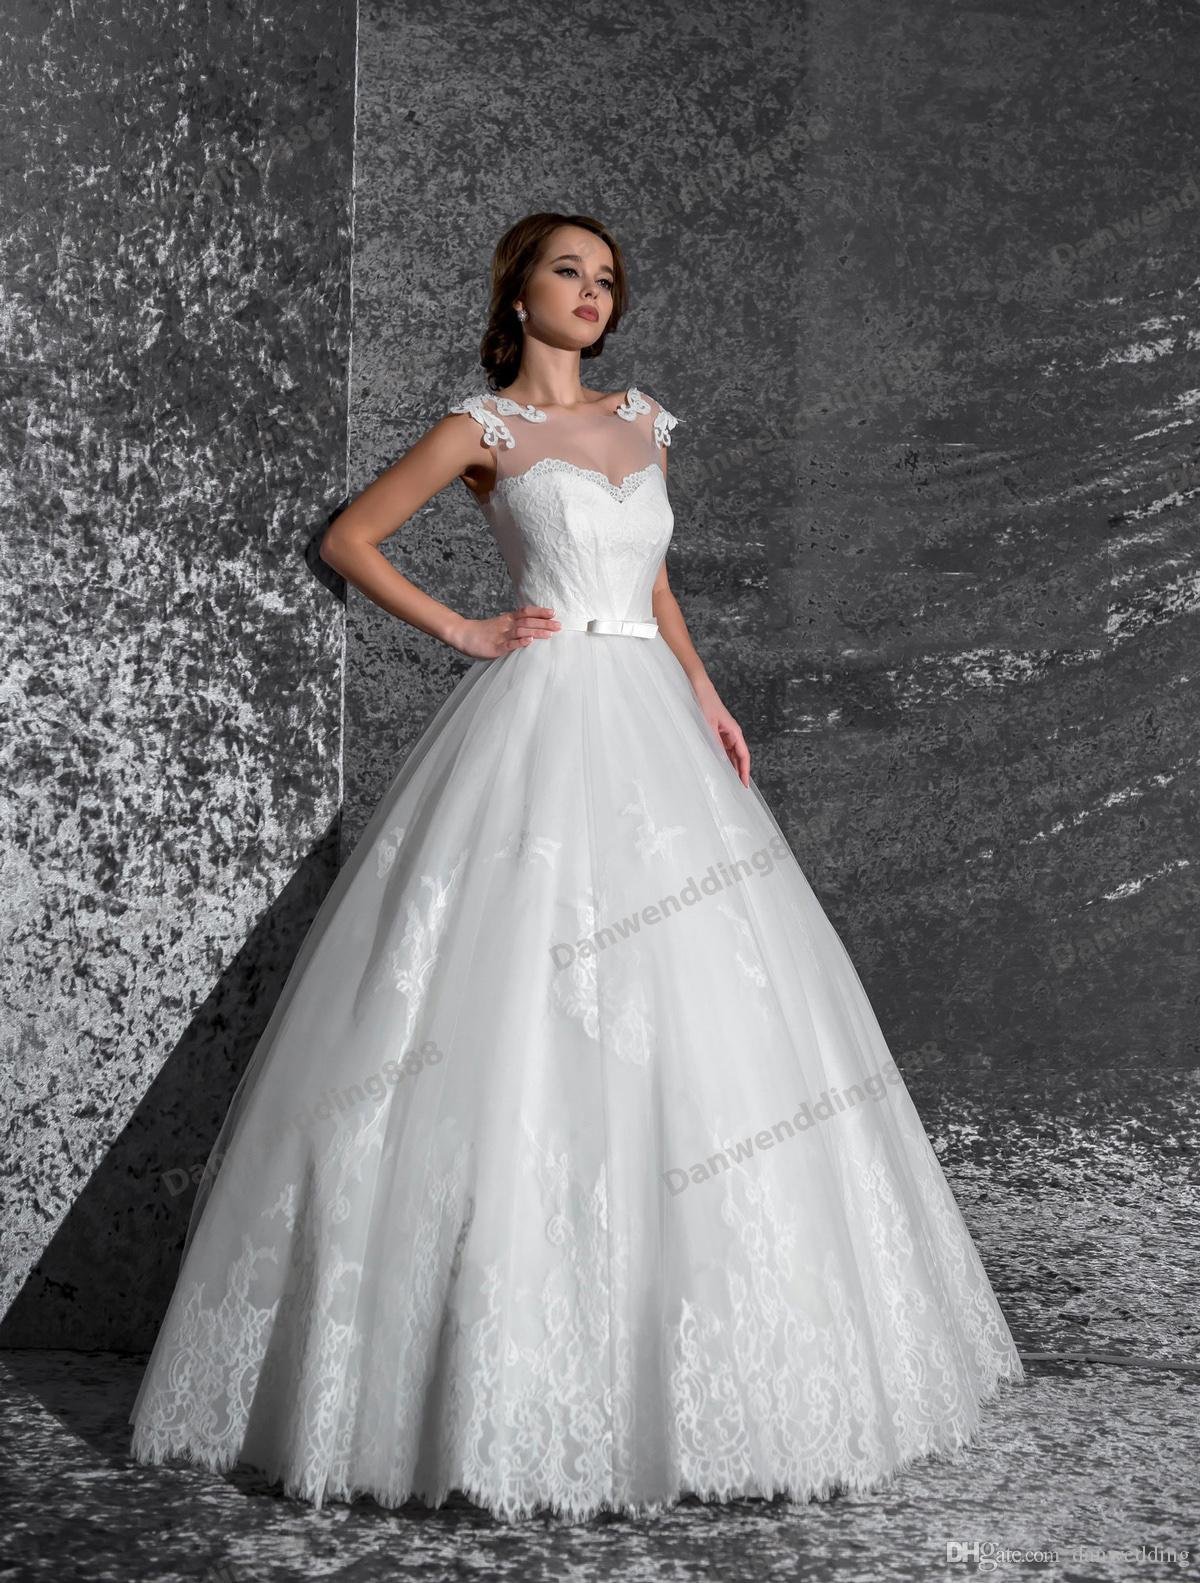 Beauty White Tulle Scoop Lace Applique A-Line Wedding Dresses Bridal Pageant Dresses Wedding Attire Dresses Custom Size 2-16 ZW607019